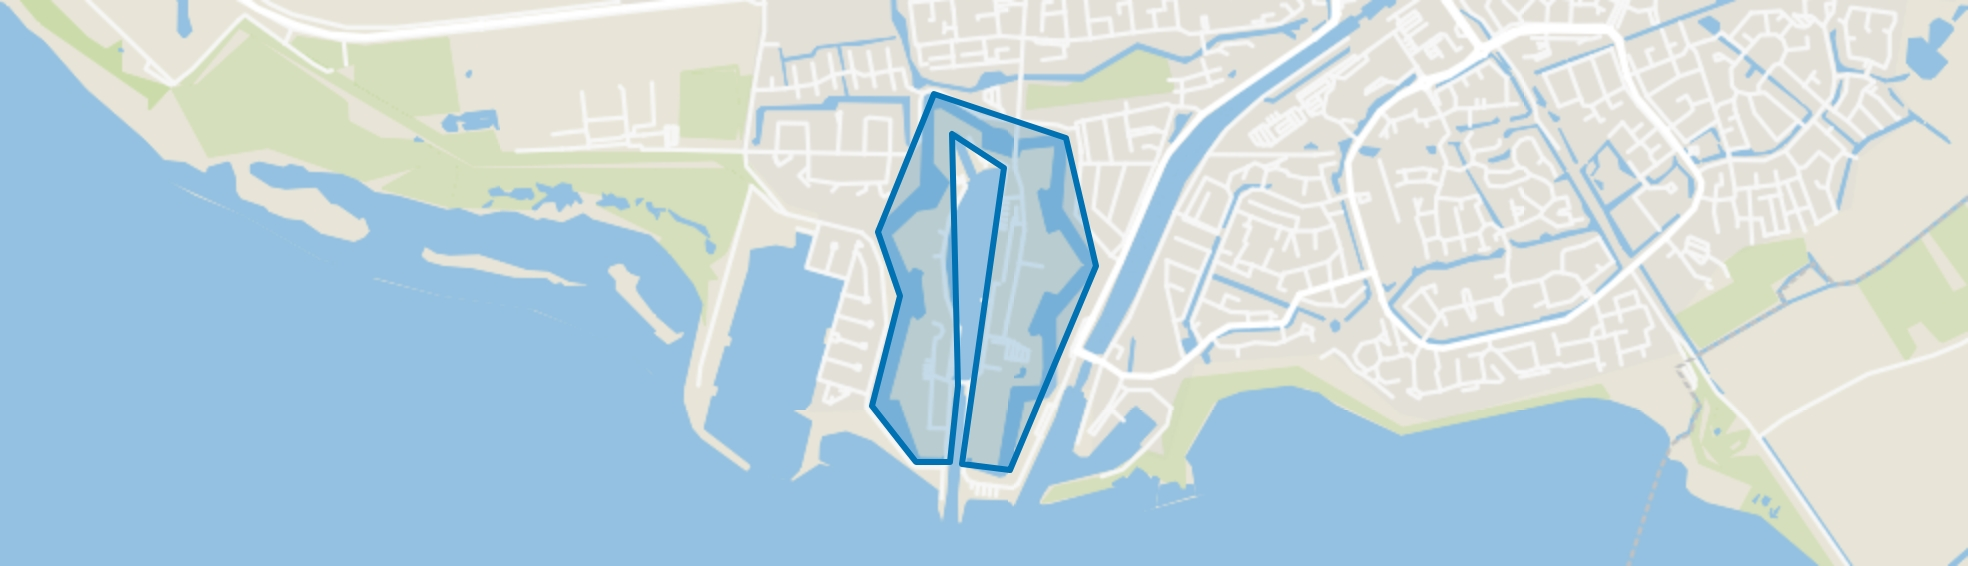 De Vesting, Hellevoetsluis map